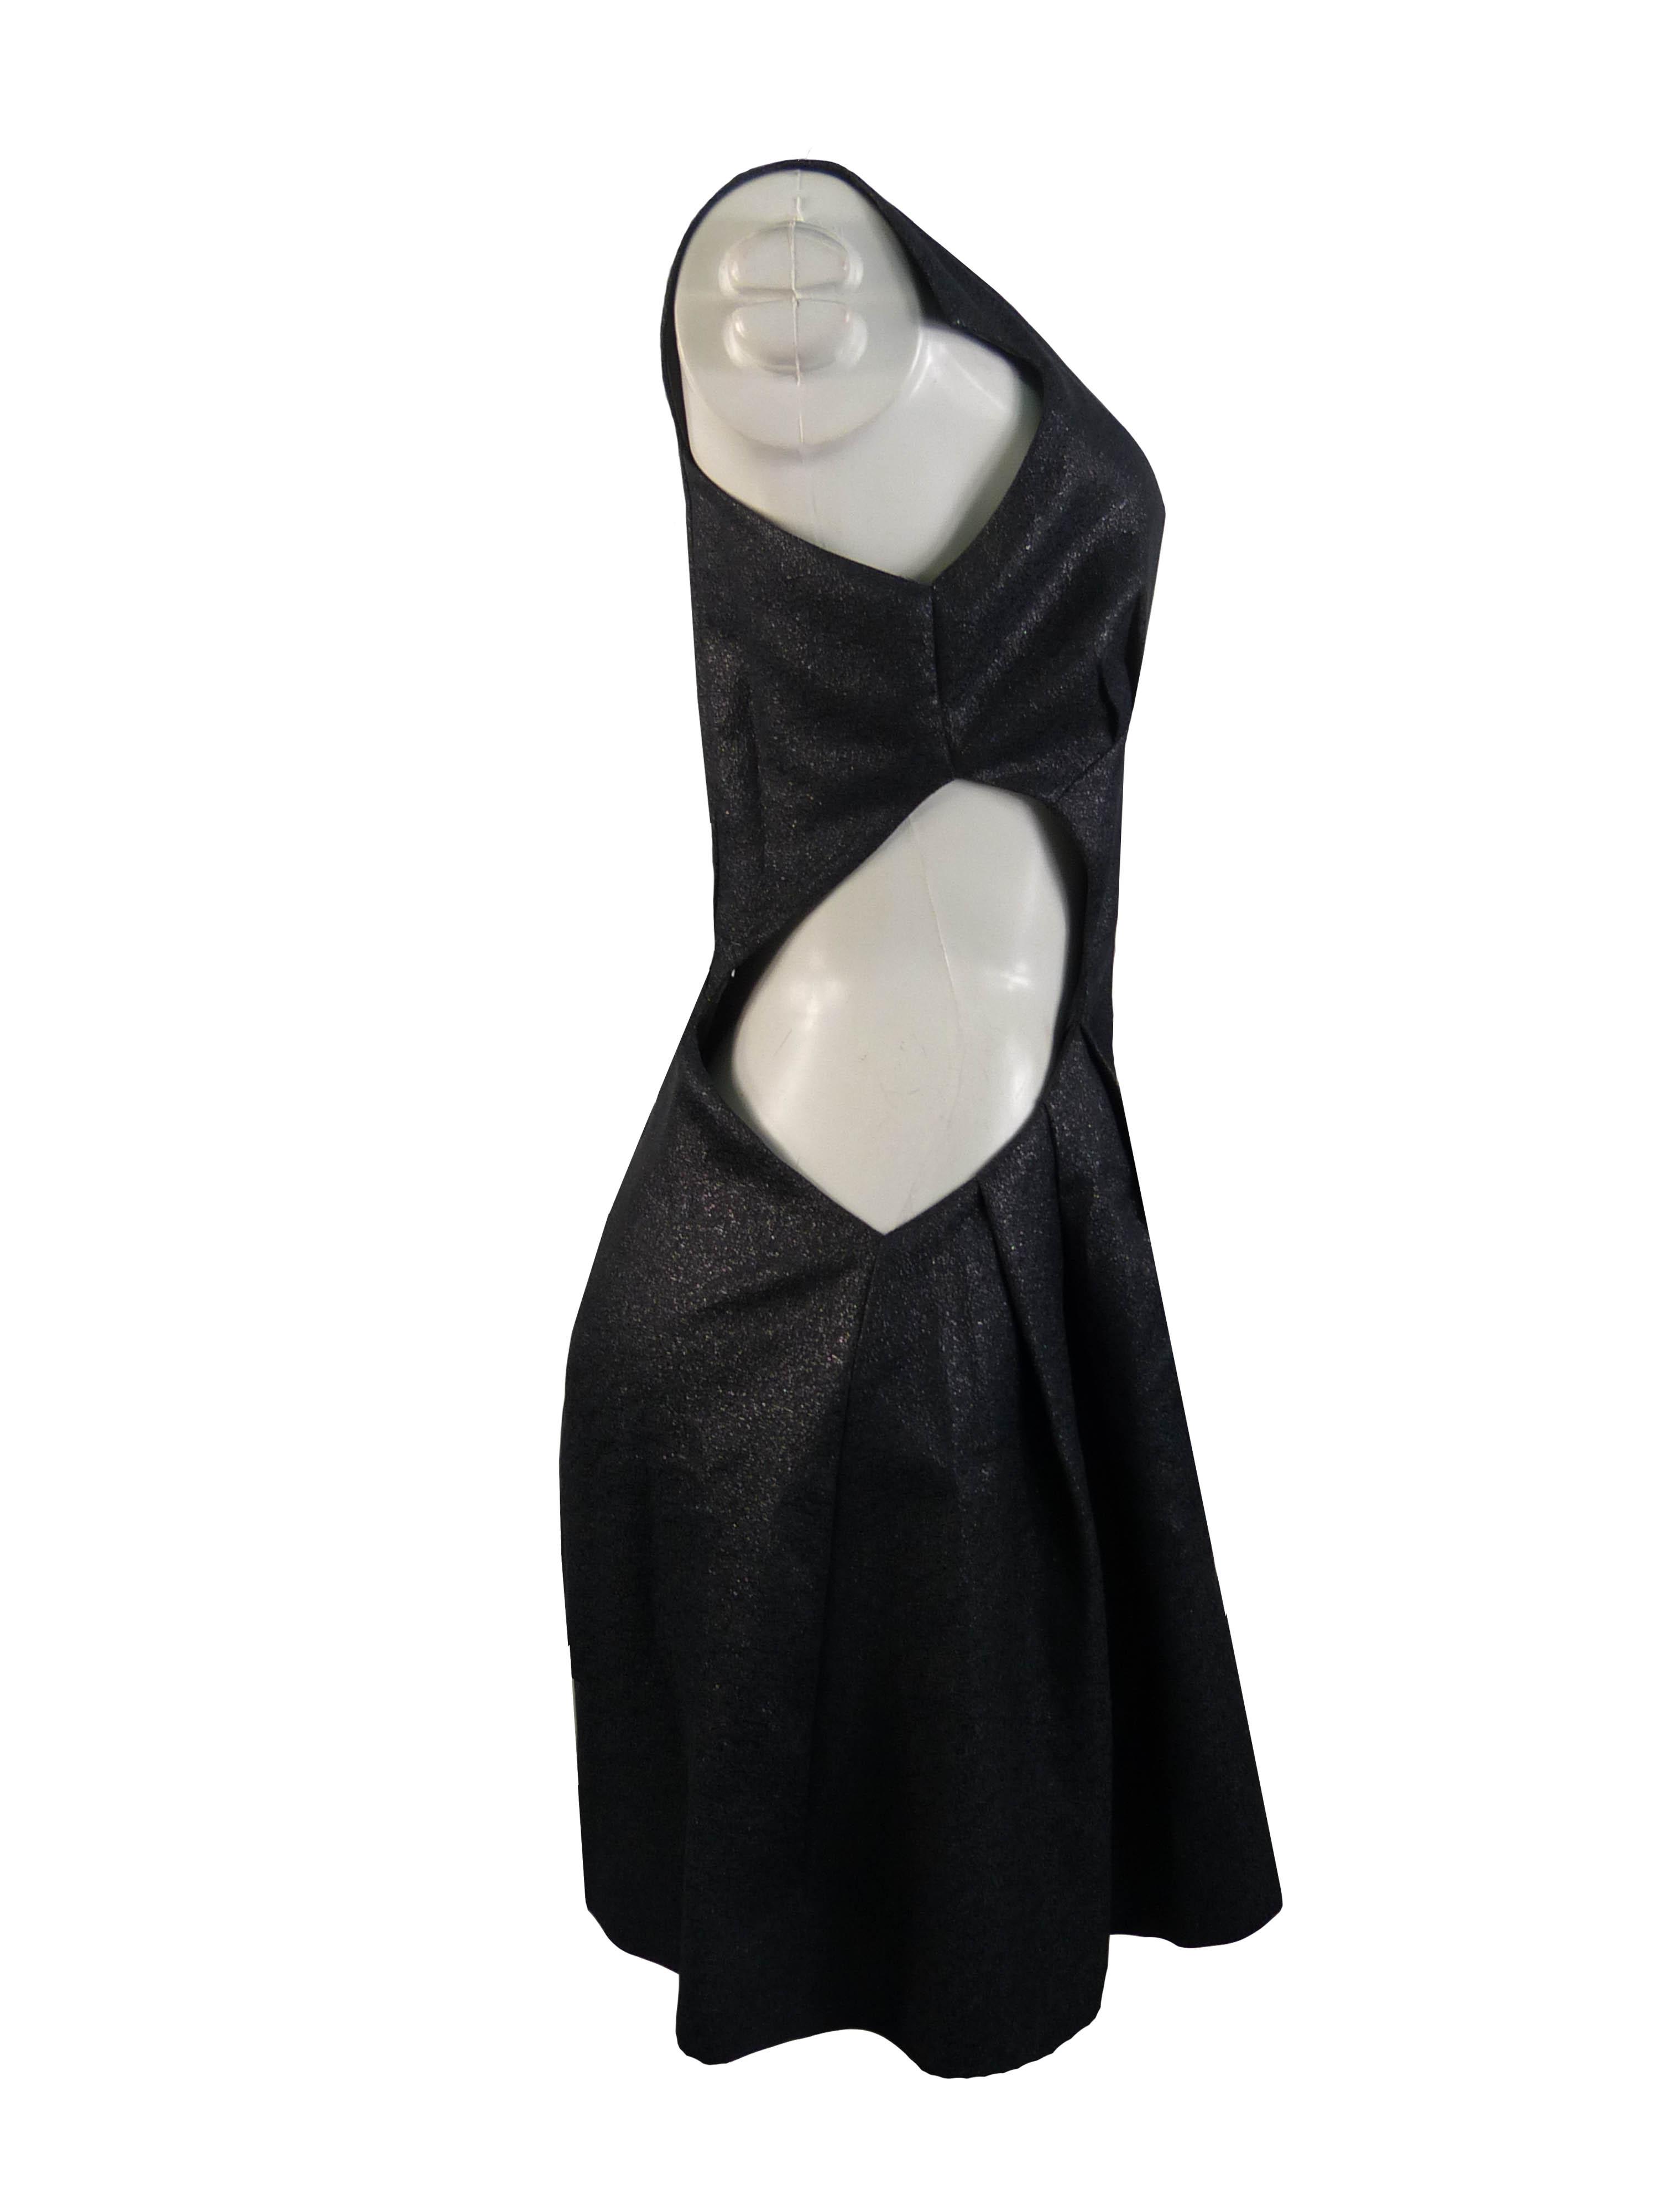 Vestido Recorte com Decote Retangular Cinza Wagner Kallieno